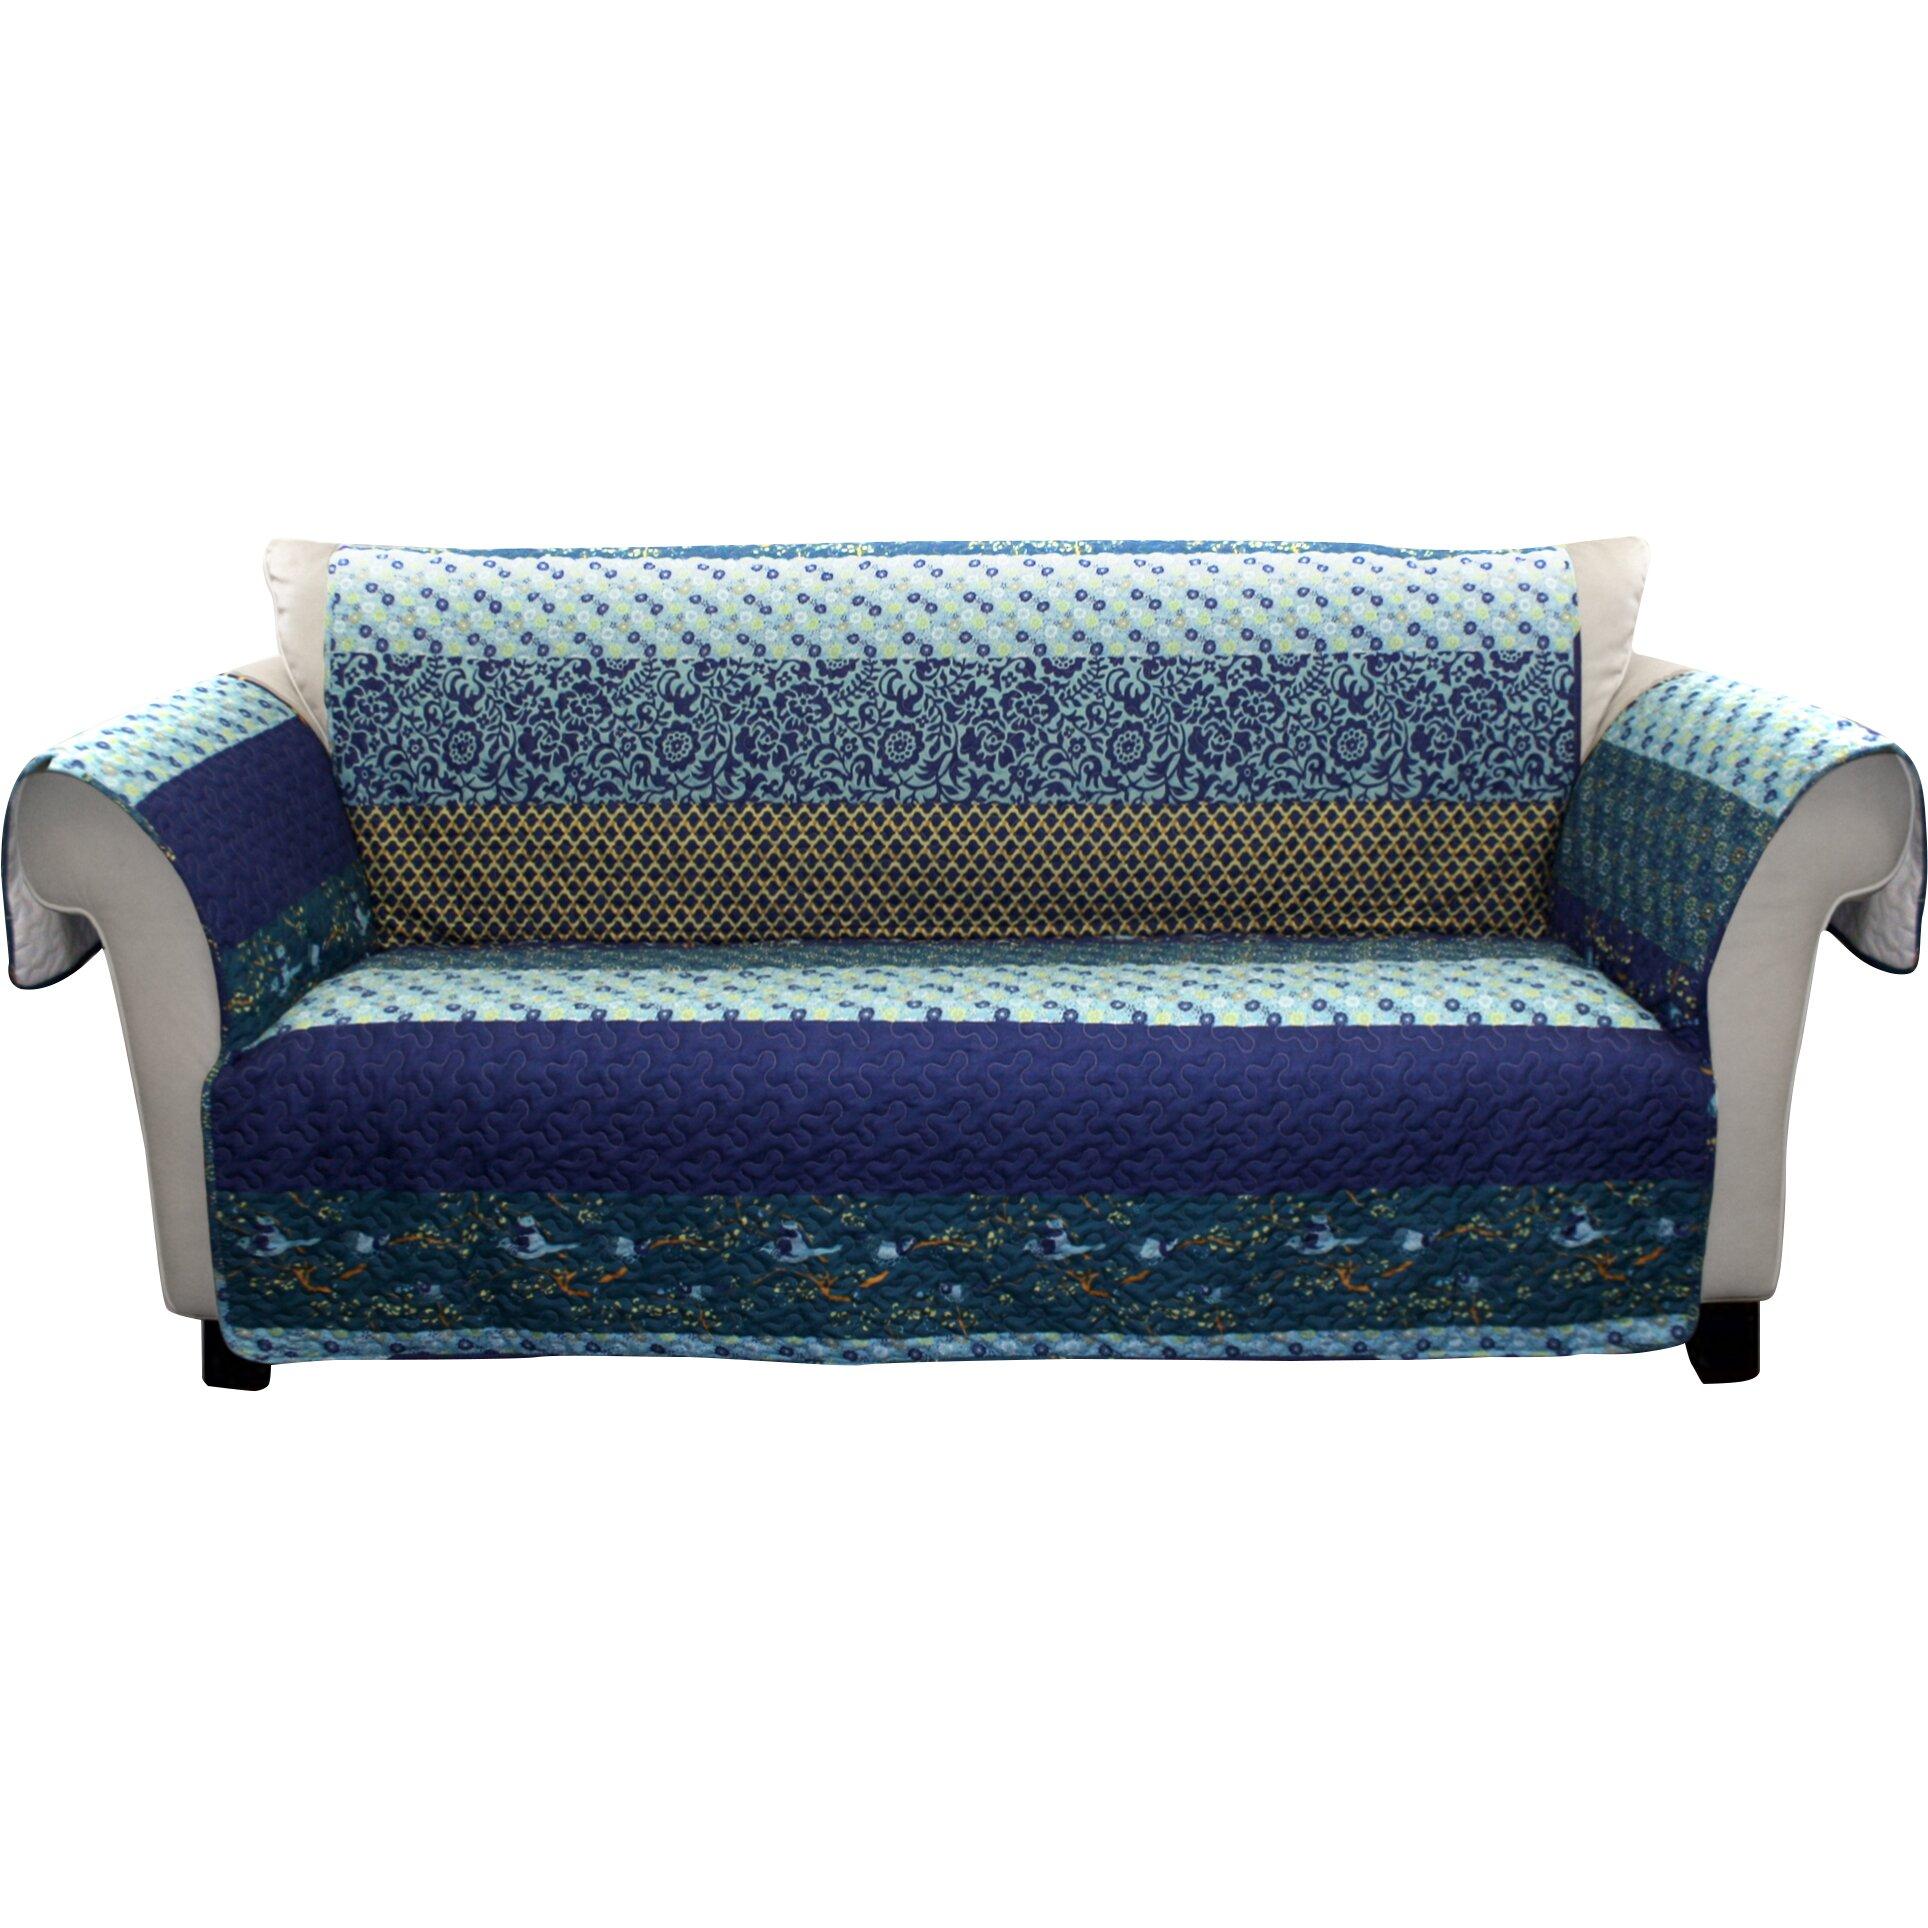 Lush Decor Royal Empire Sofa Furniture Protector & Reviews